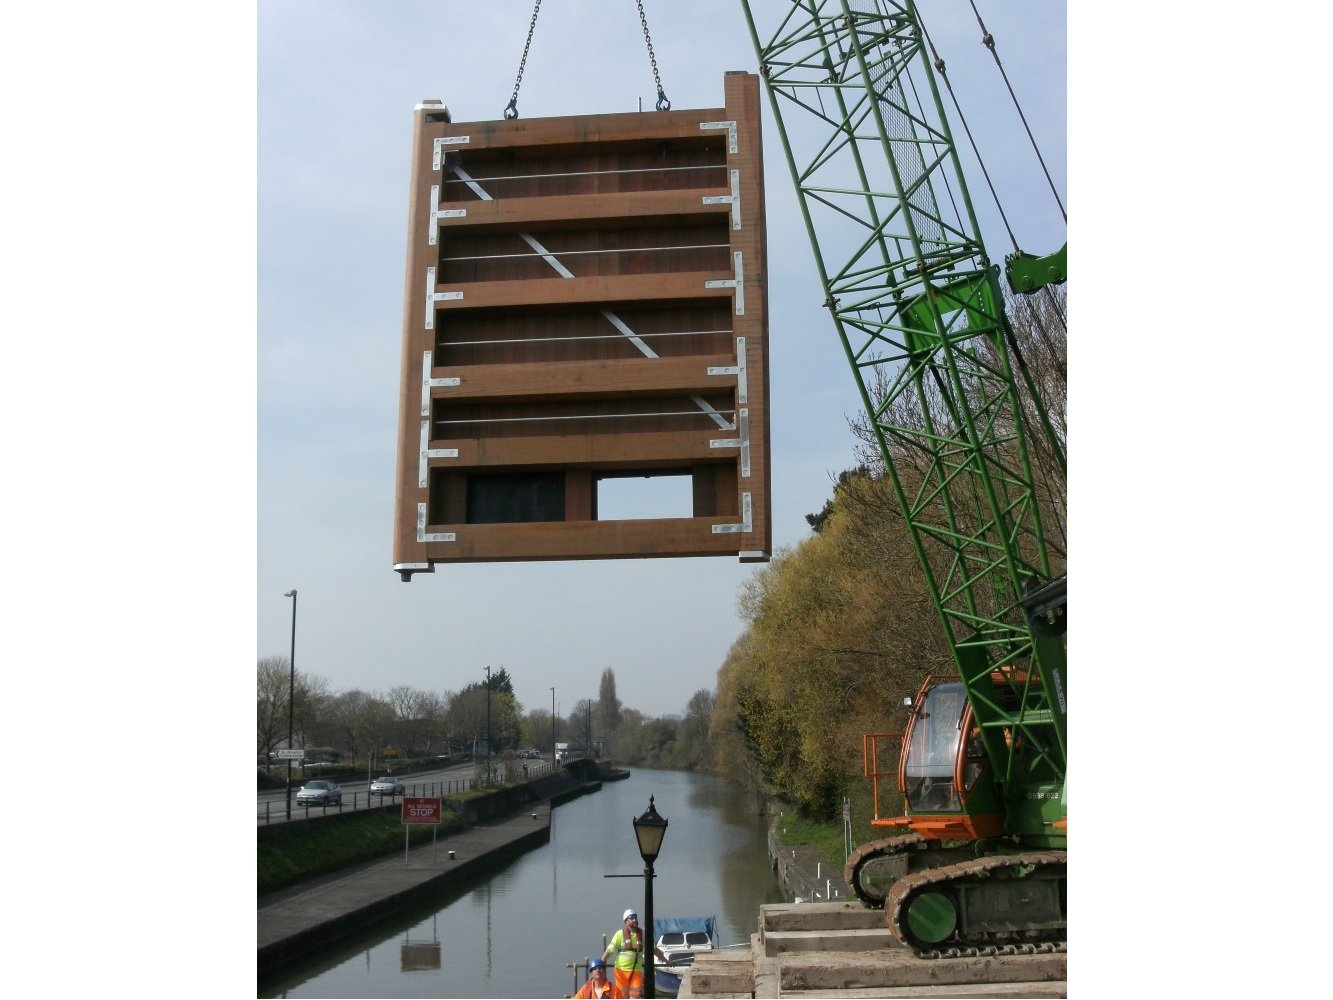 Timber lock gate installation